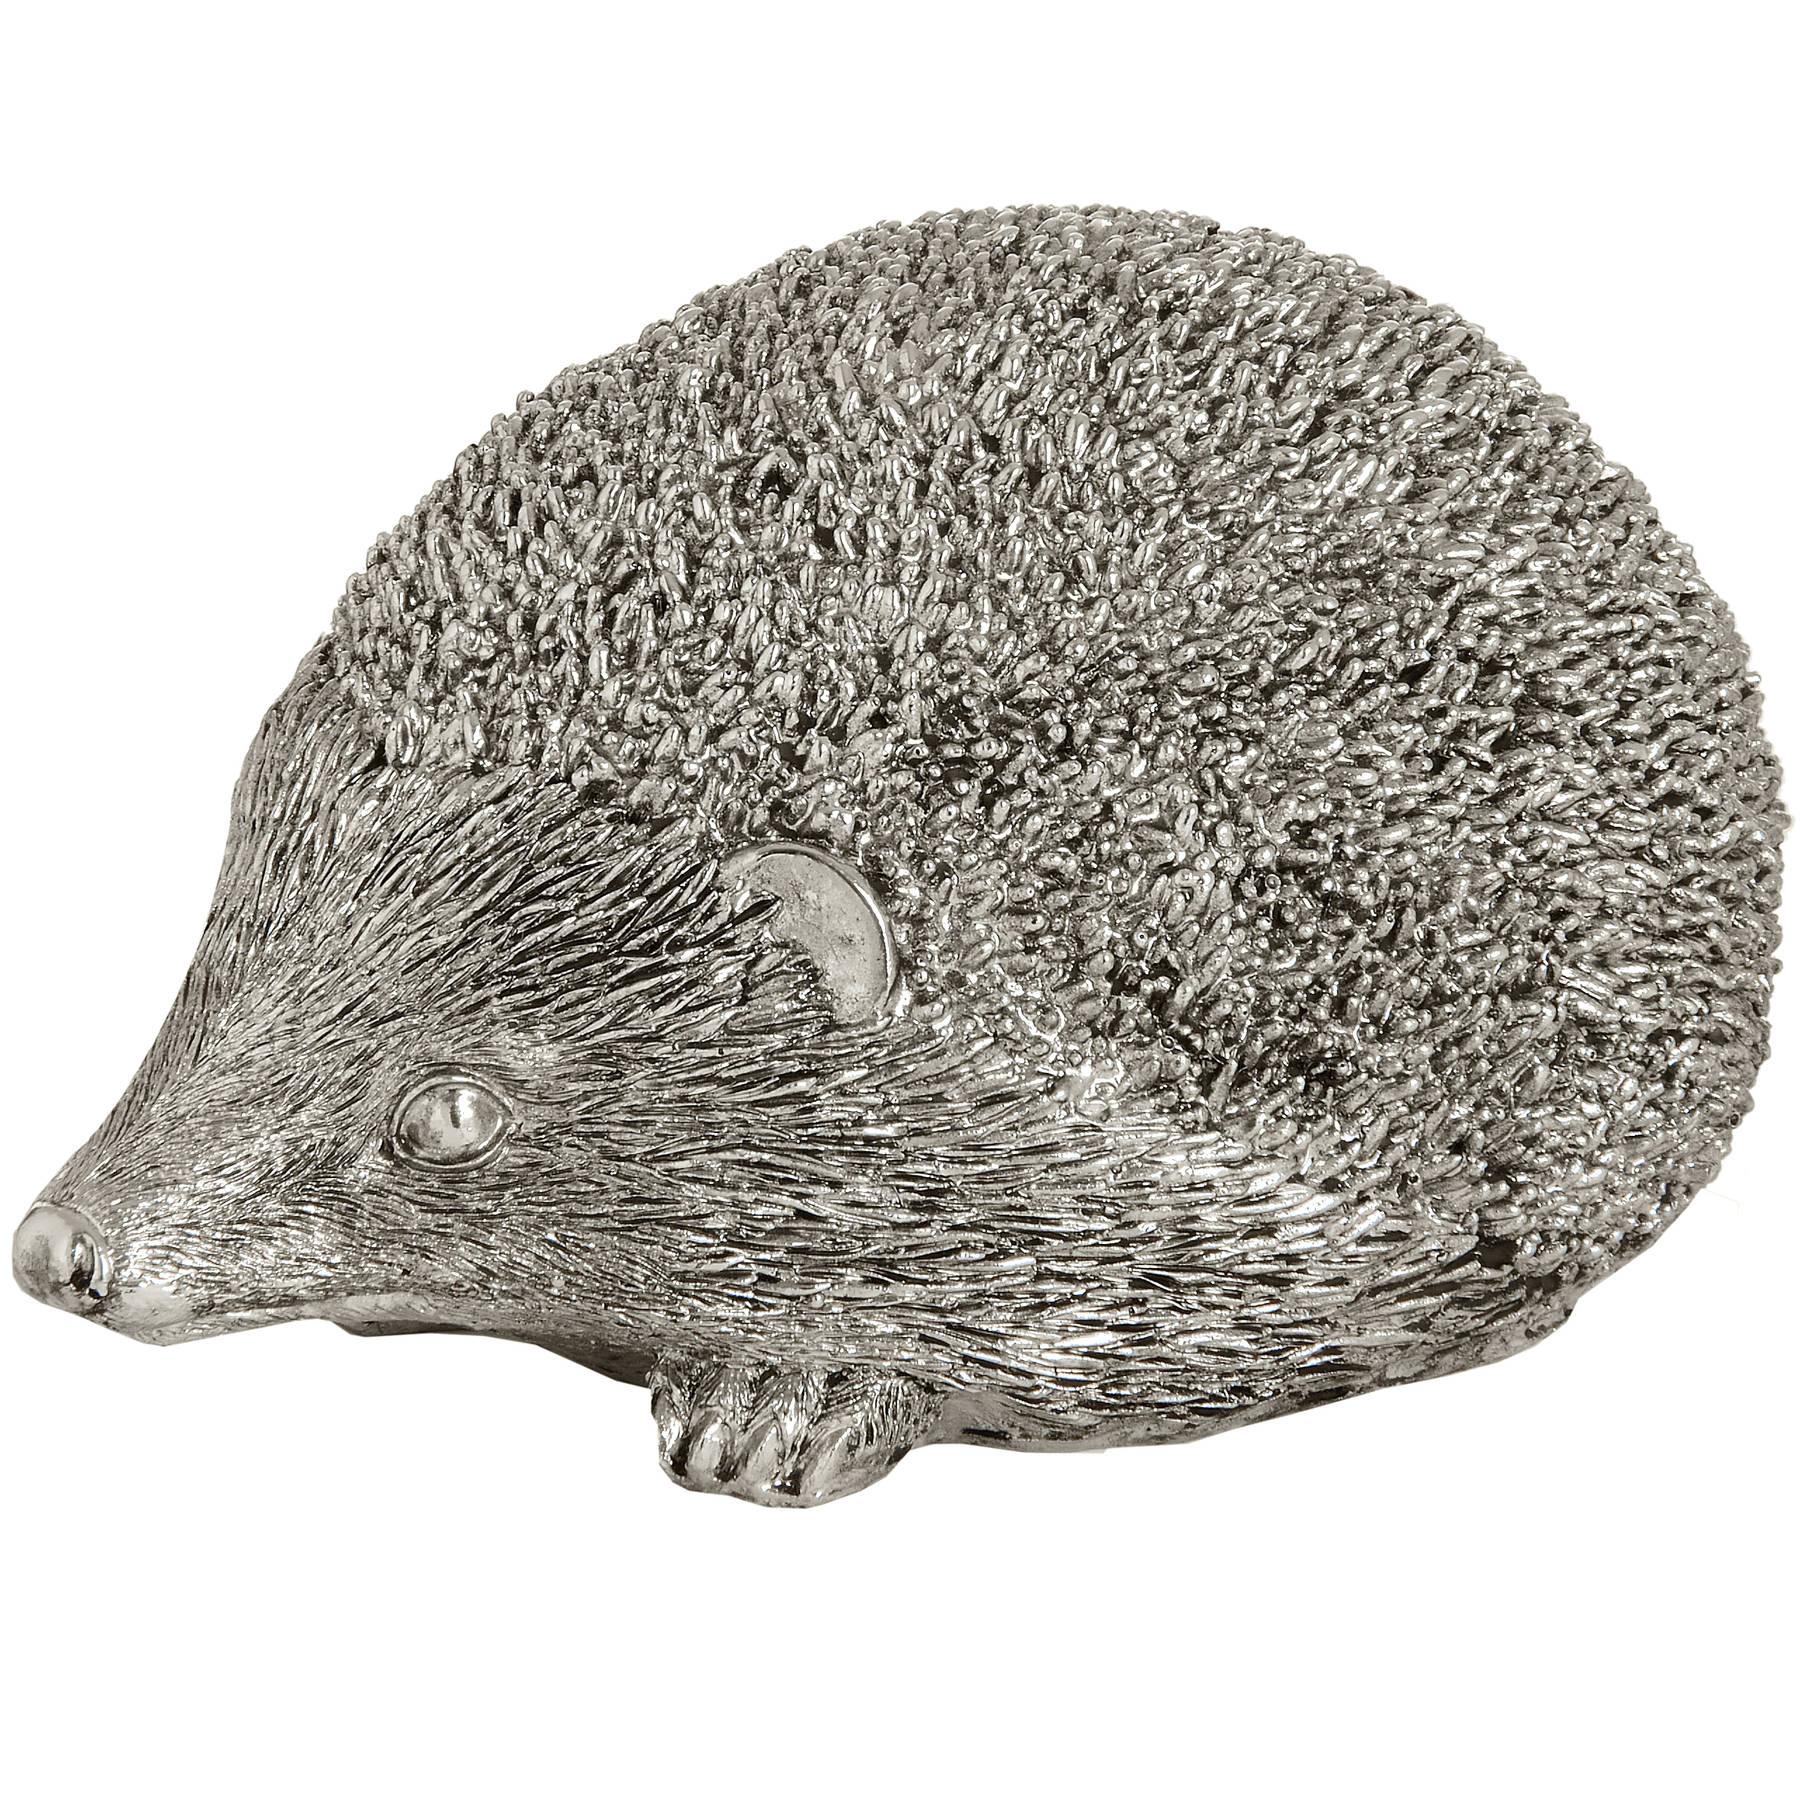 Henry The Silver Hedgehog - Image 2